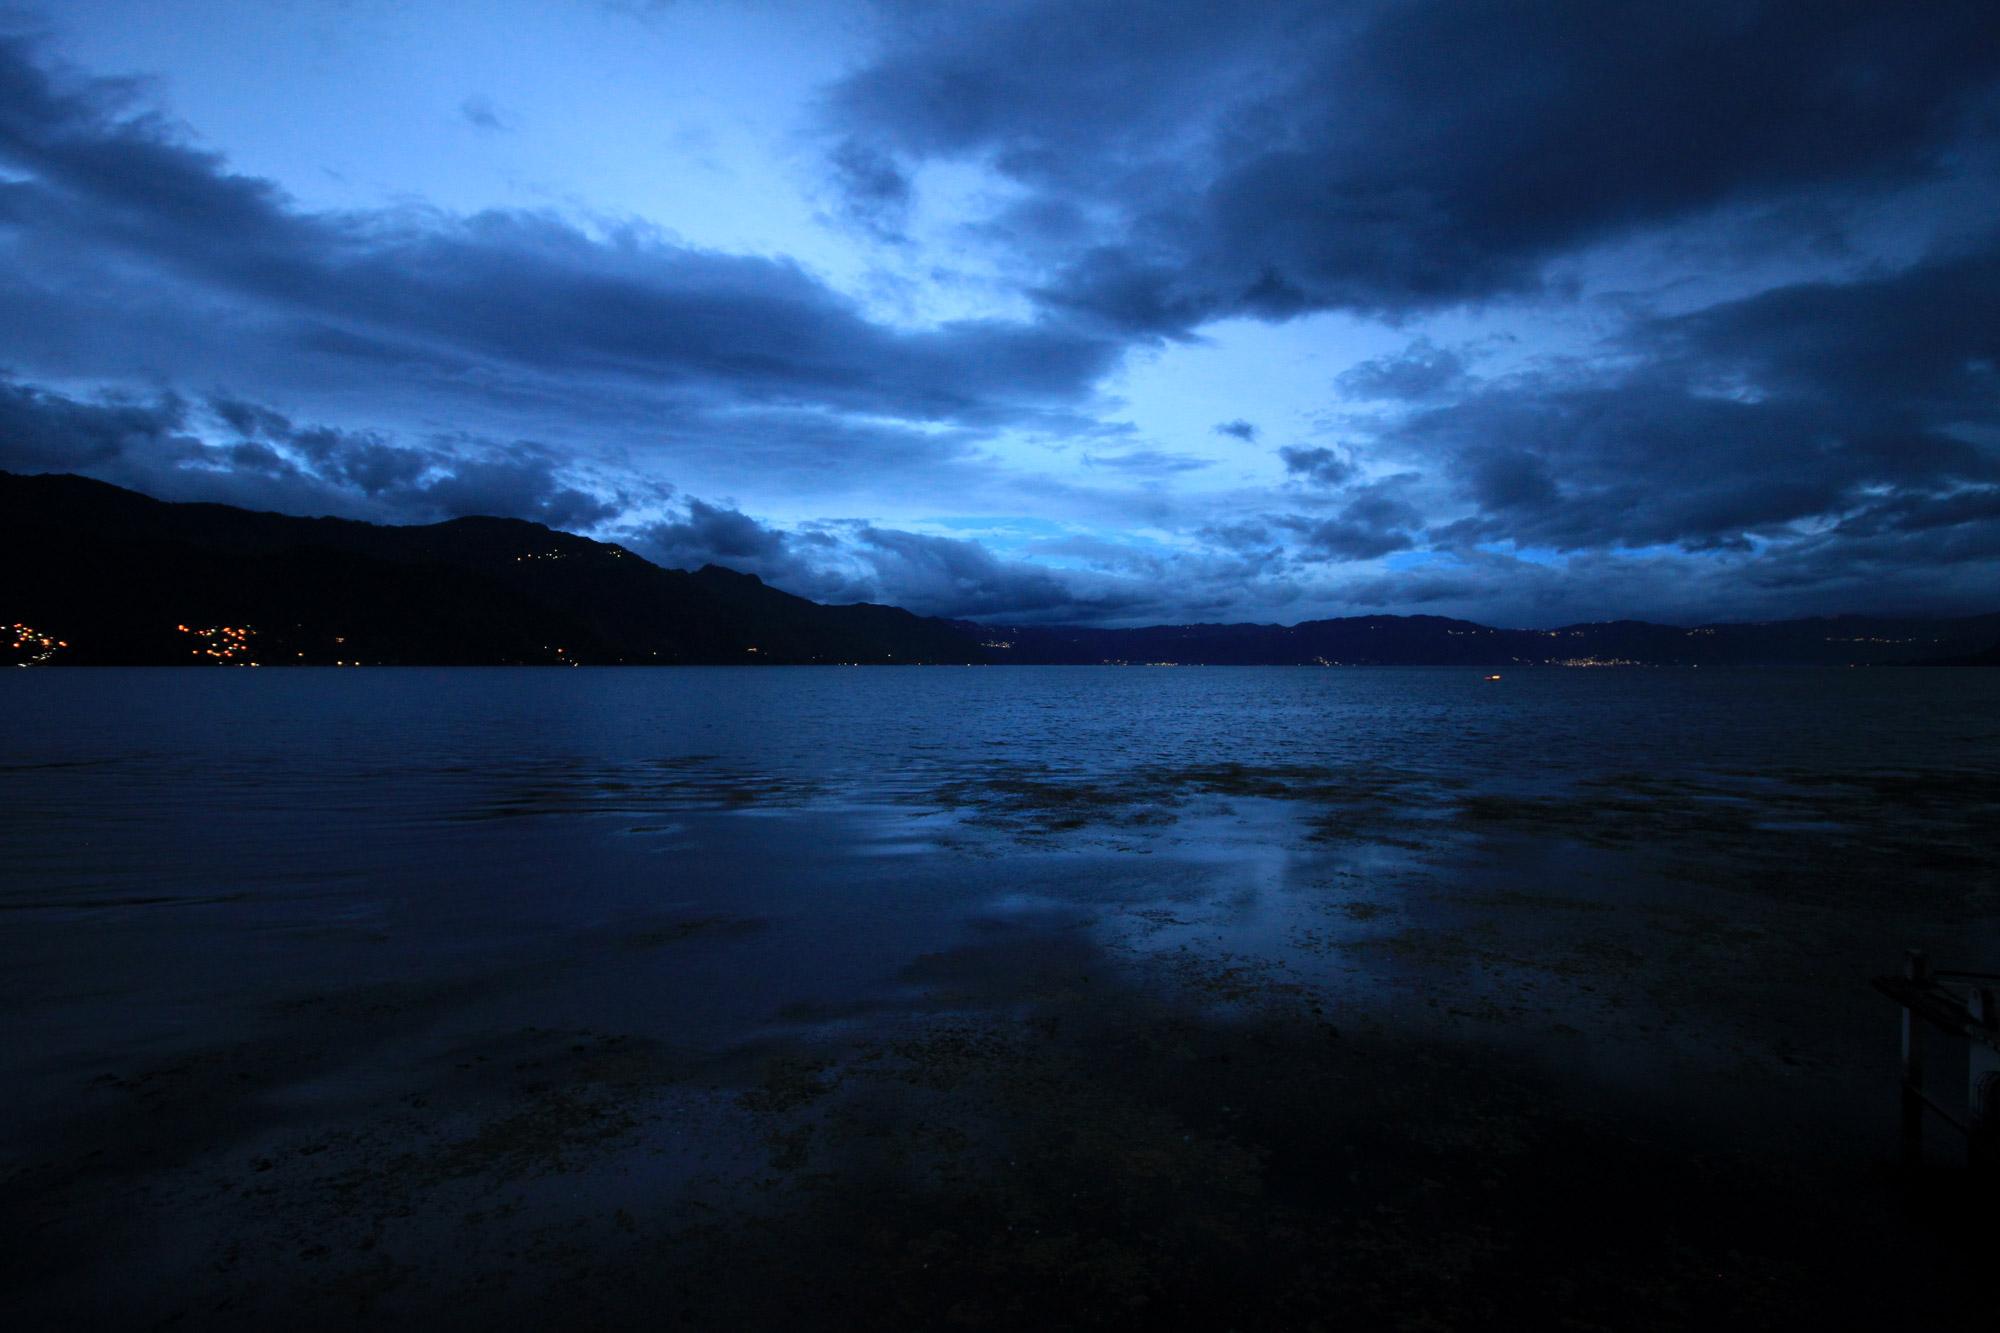 Guatemala 2015 - dag 17 - Het blauwe uurtje bij Lake Atitlan